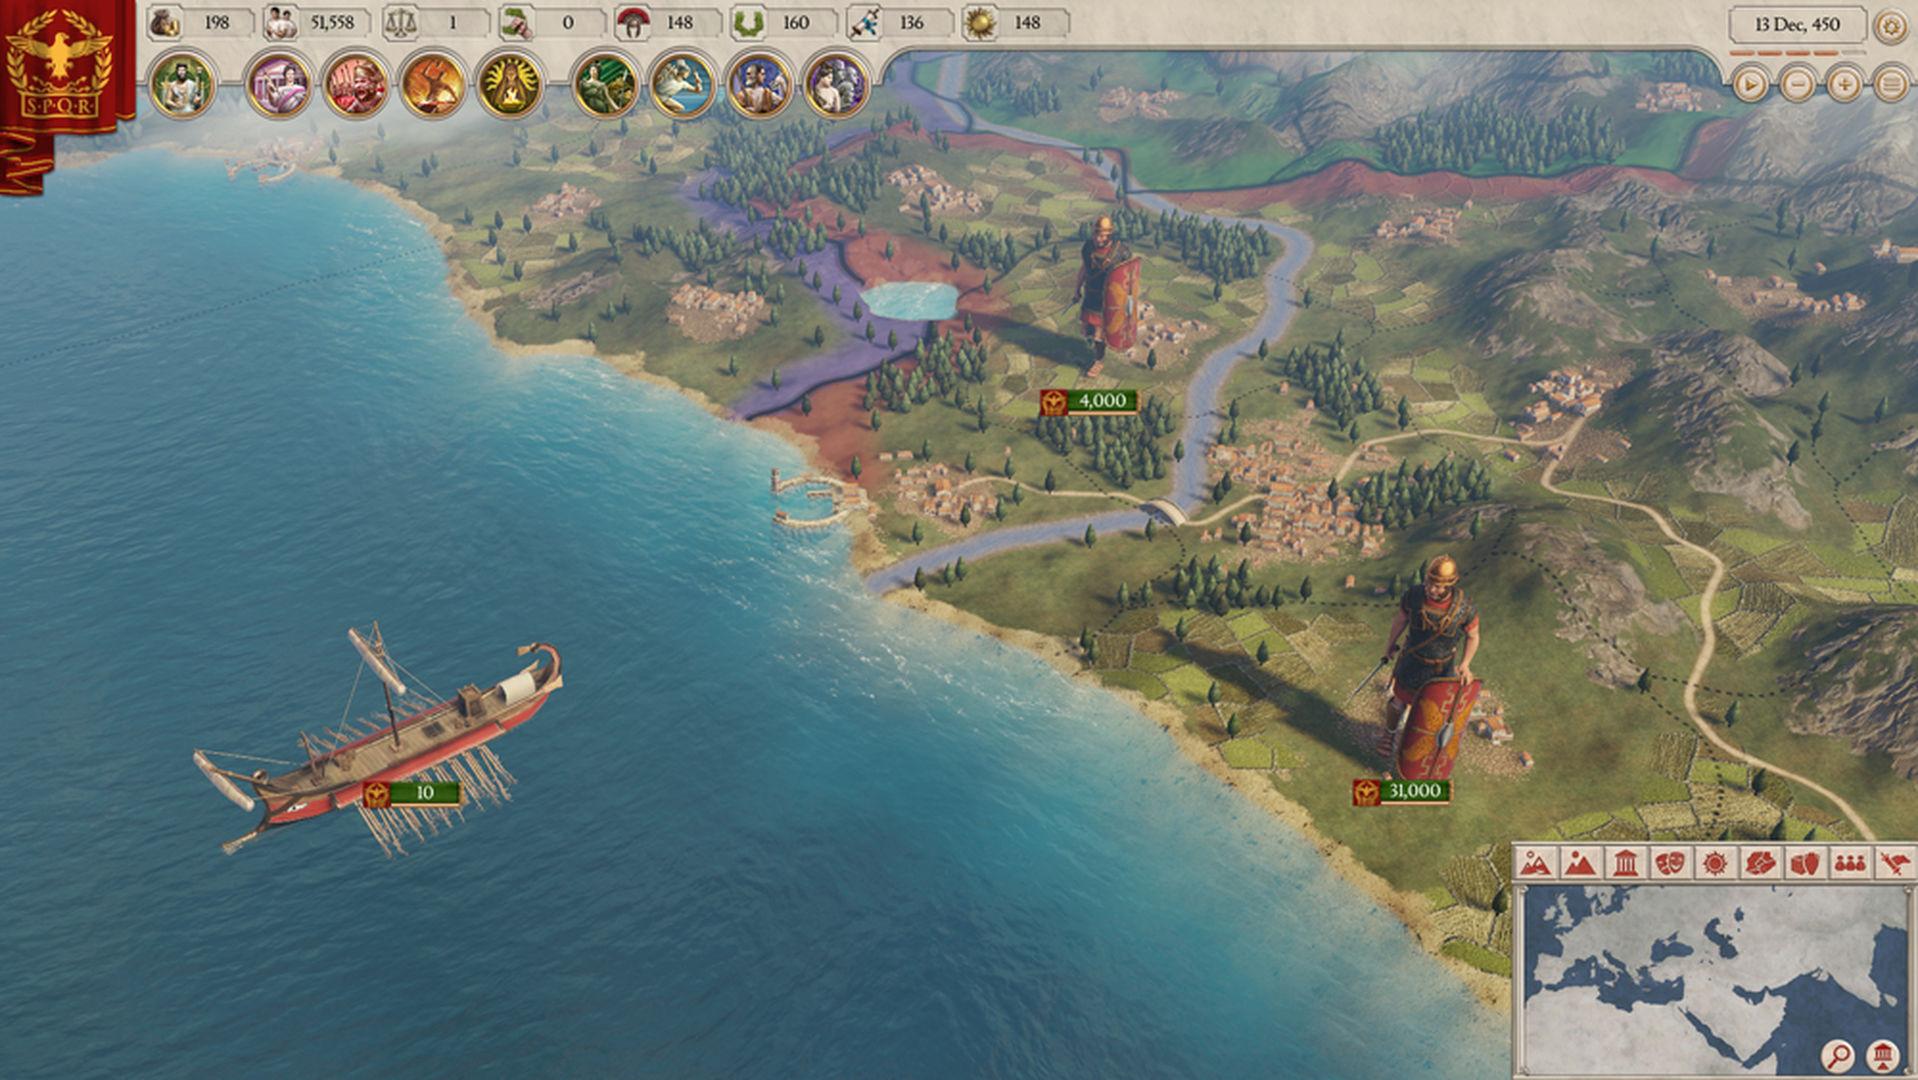 imperator rome wallpaper ile ilgili görsel sonucu